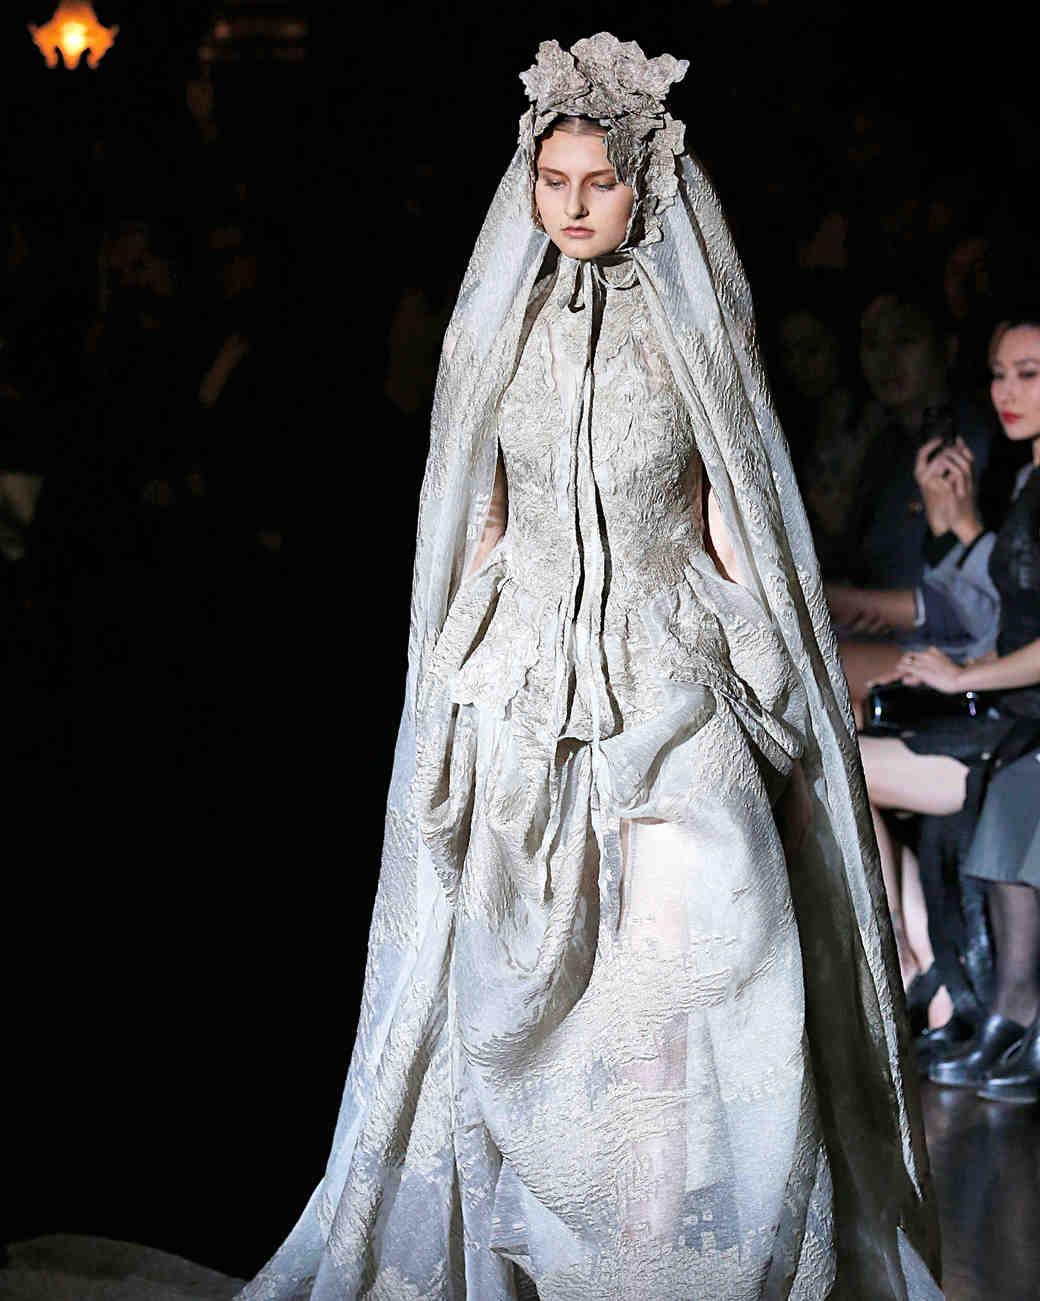 haute-couture-fall-2014-franck-sorbier-0714.jpg